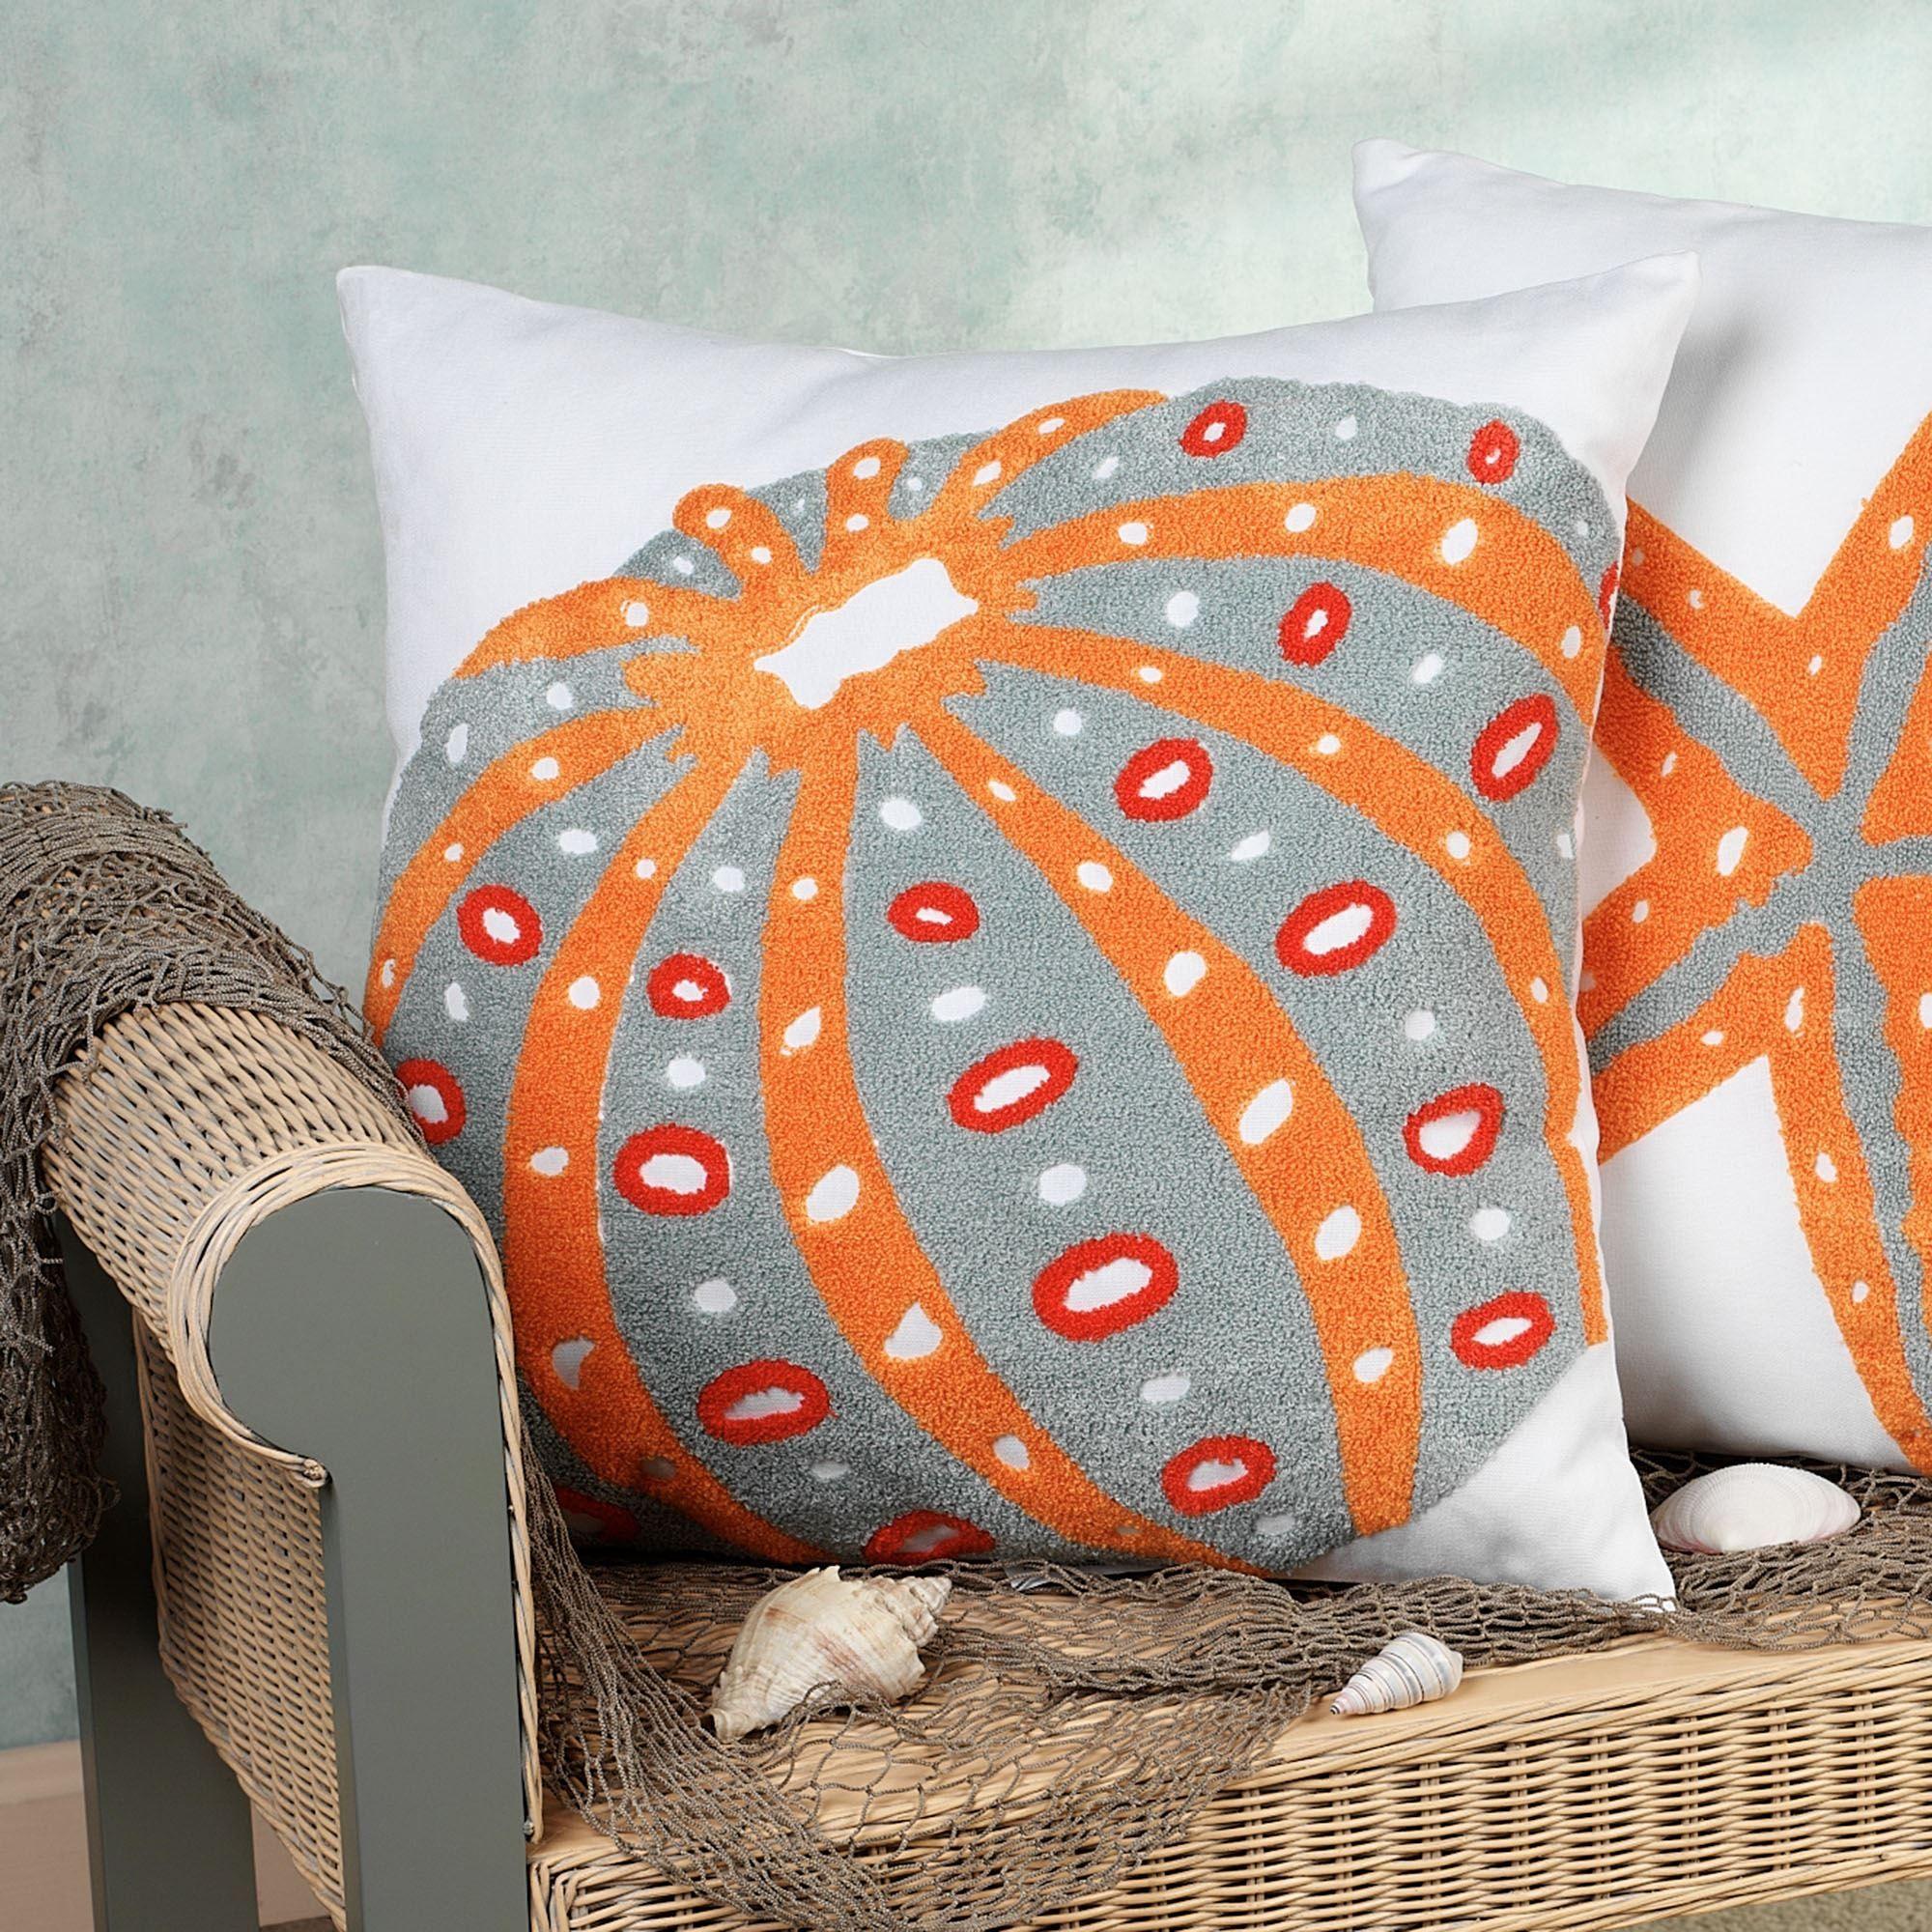 Fiesta Key Coastal Decorative Pillows